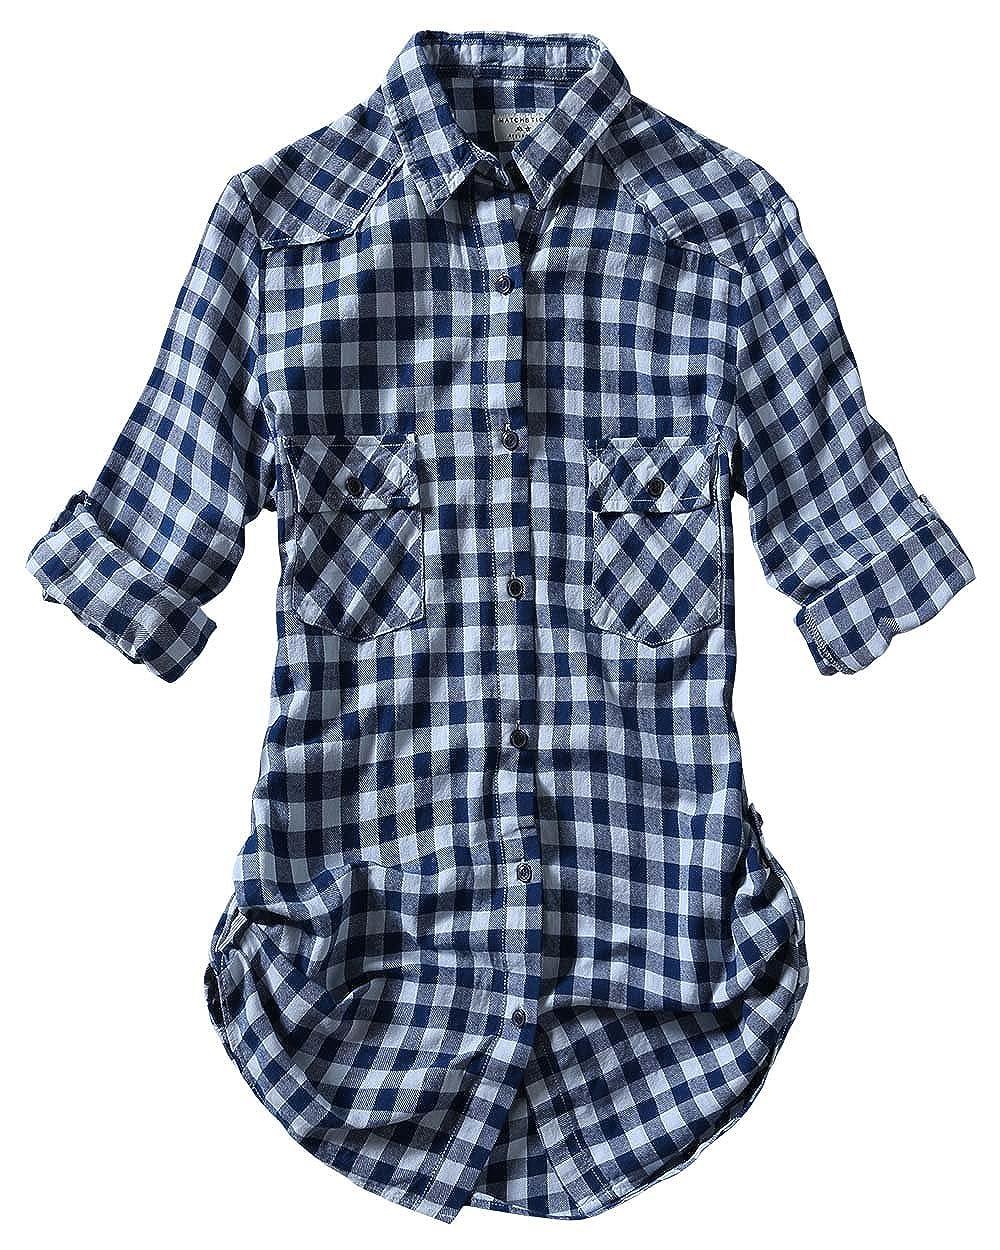 2022 Check 7 Match Women's Long Sleeve Flannel Plaid Shirt